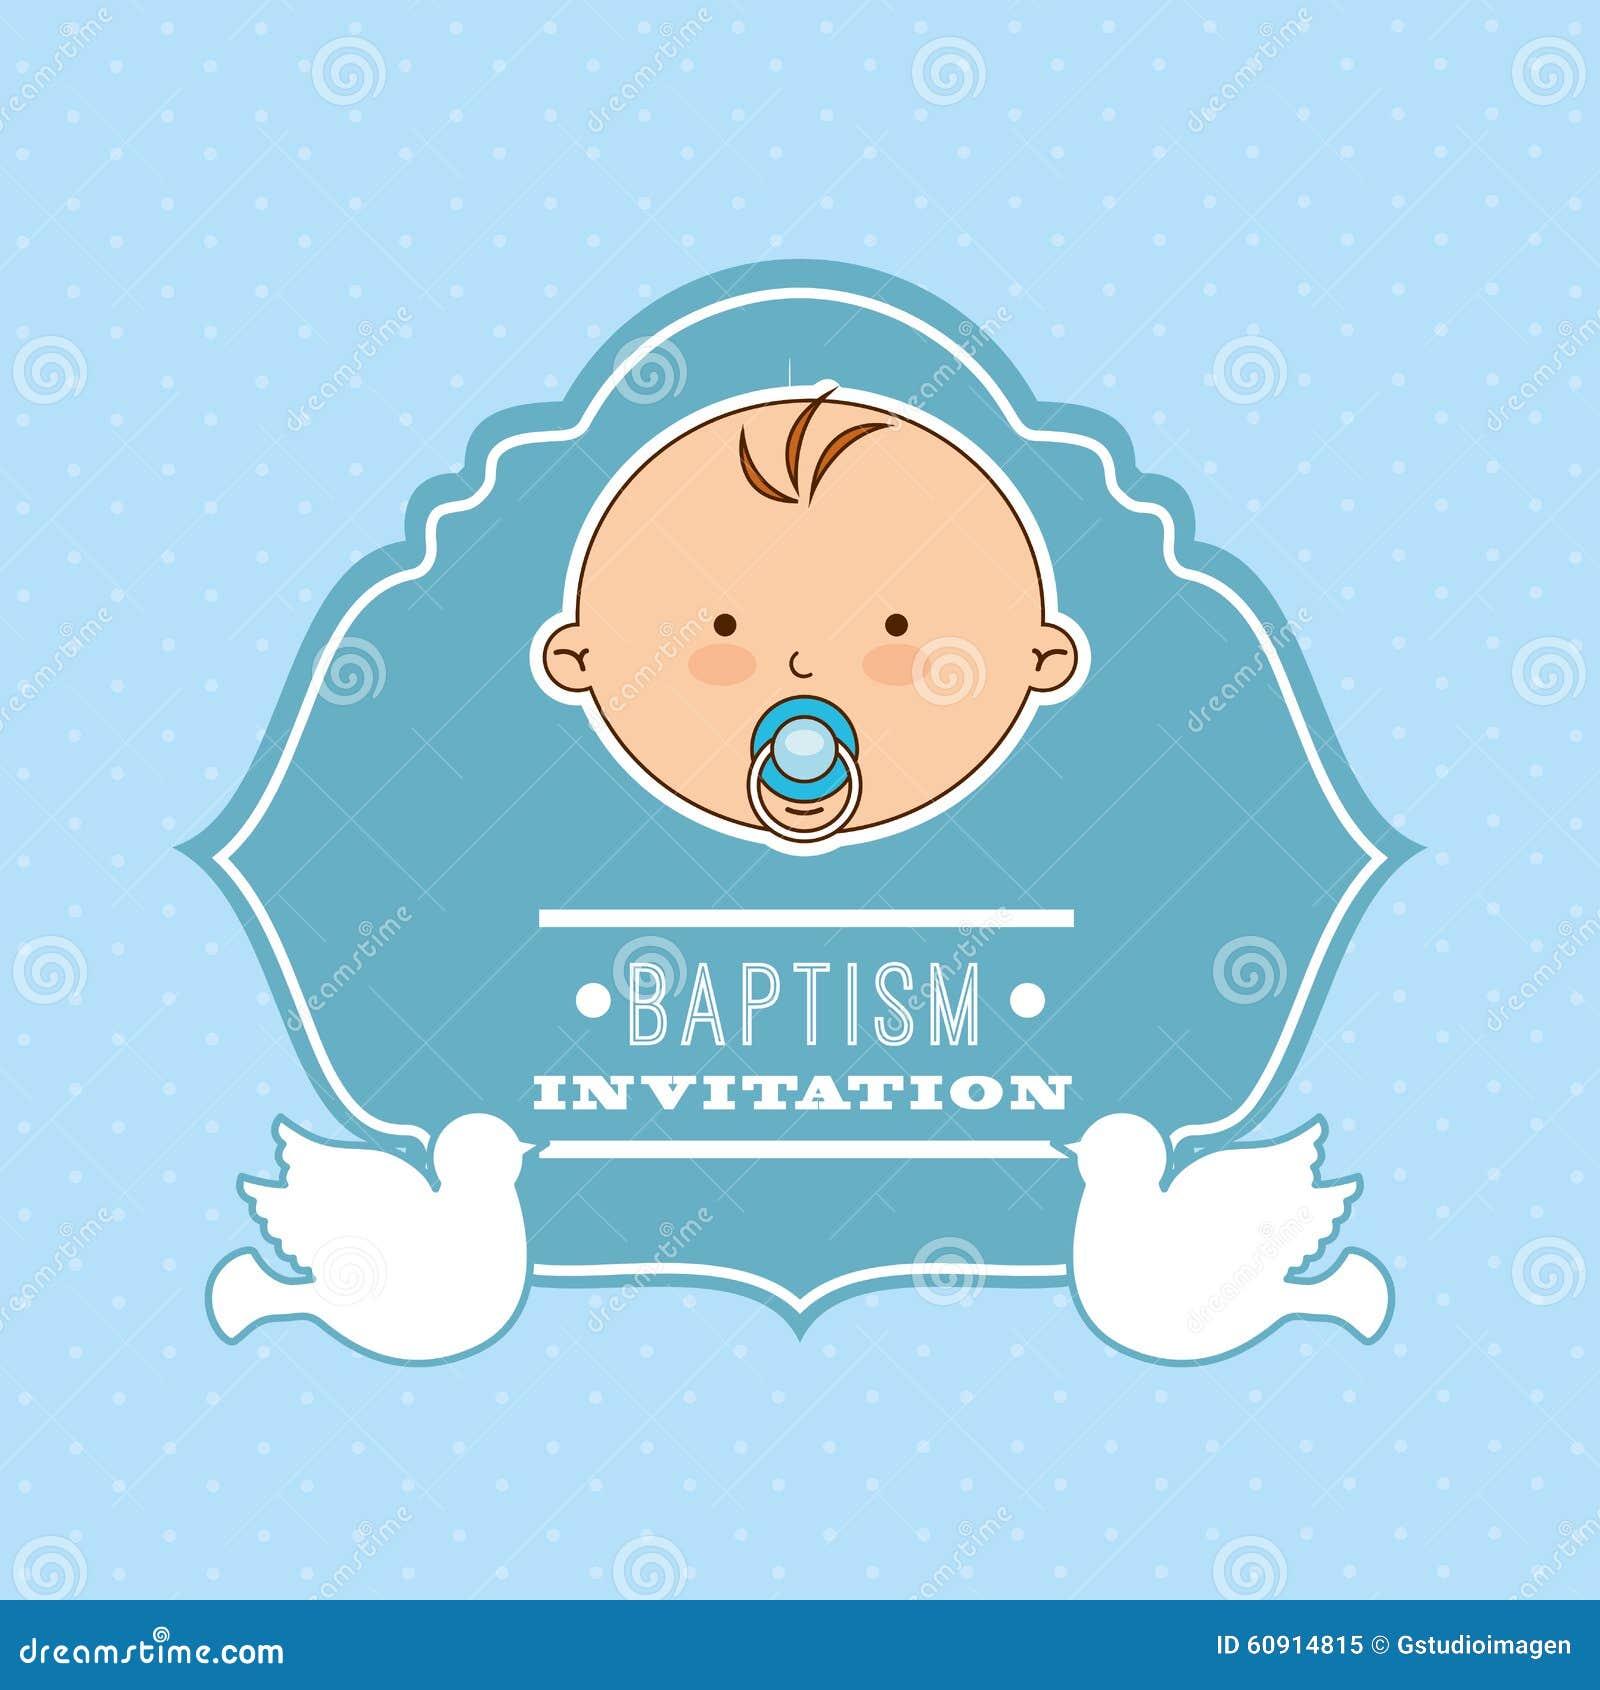 Baptism Invitation Design Stock Vector - Image: 60914815